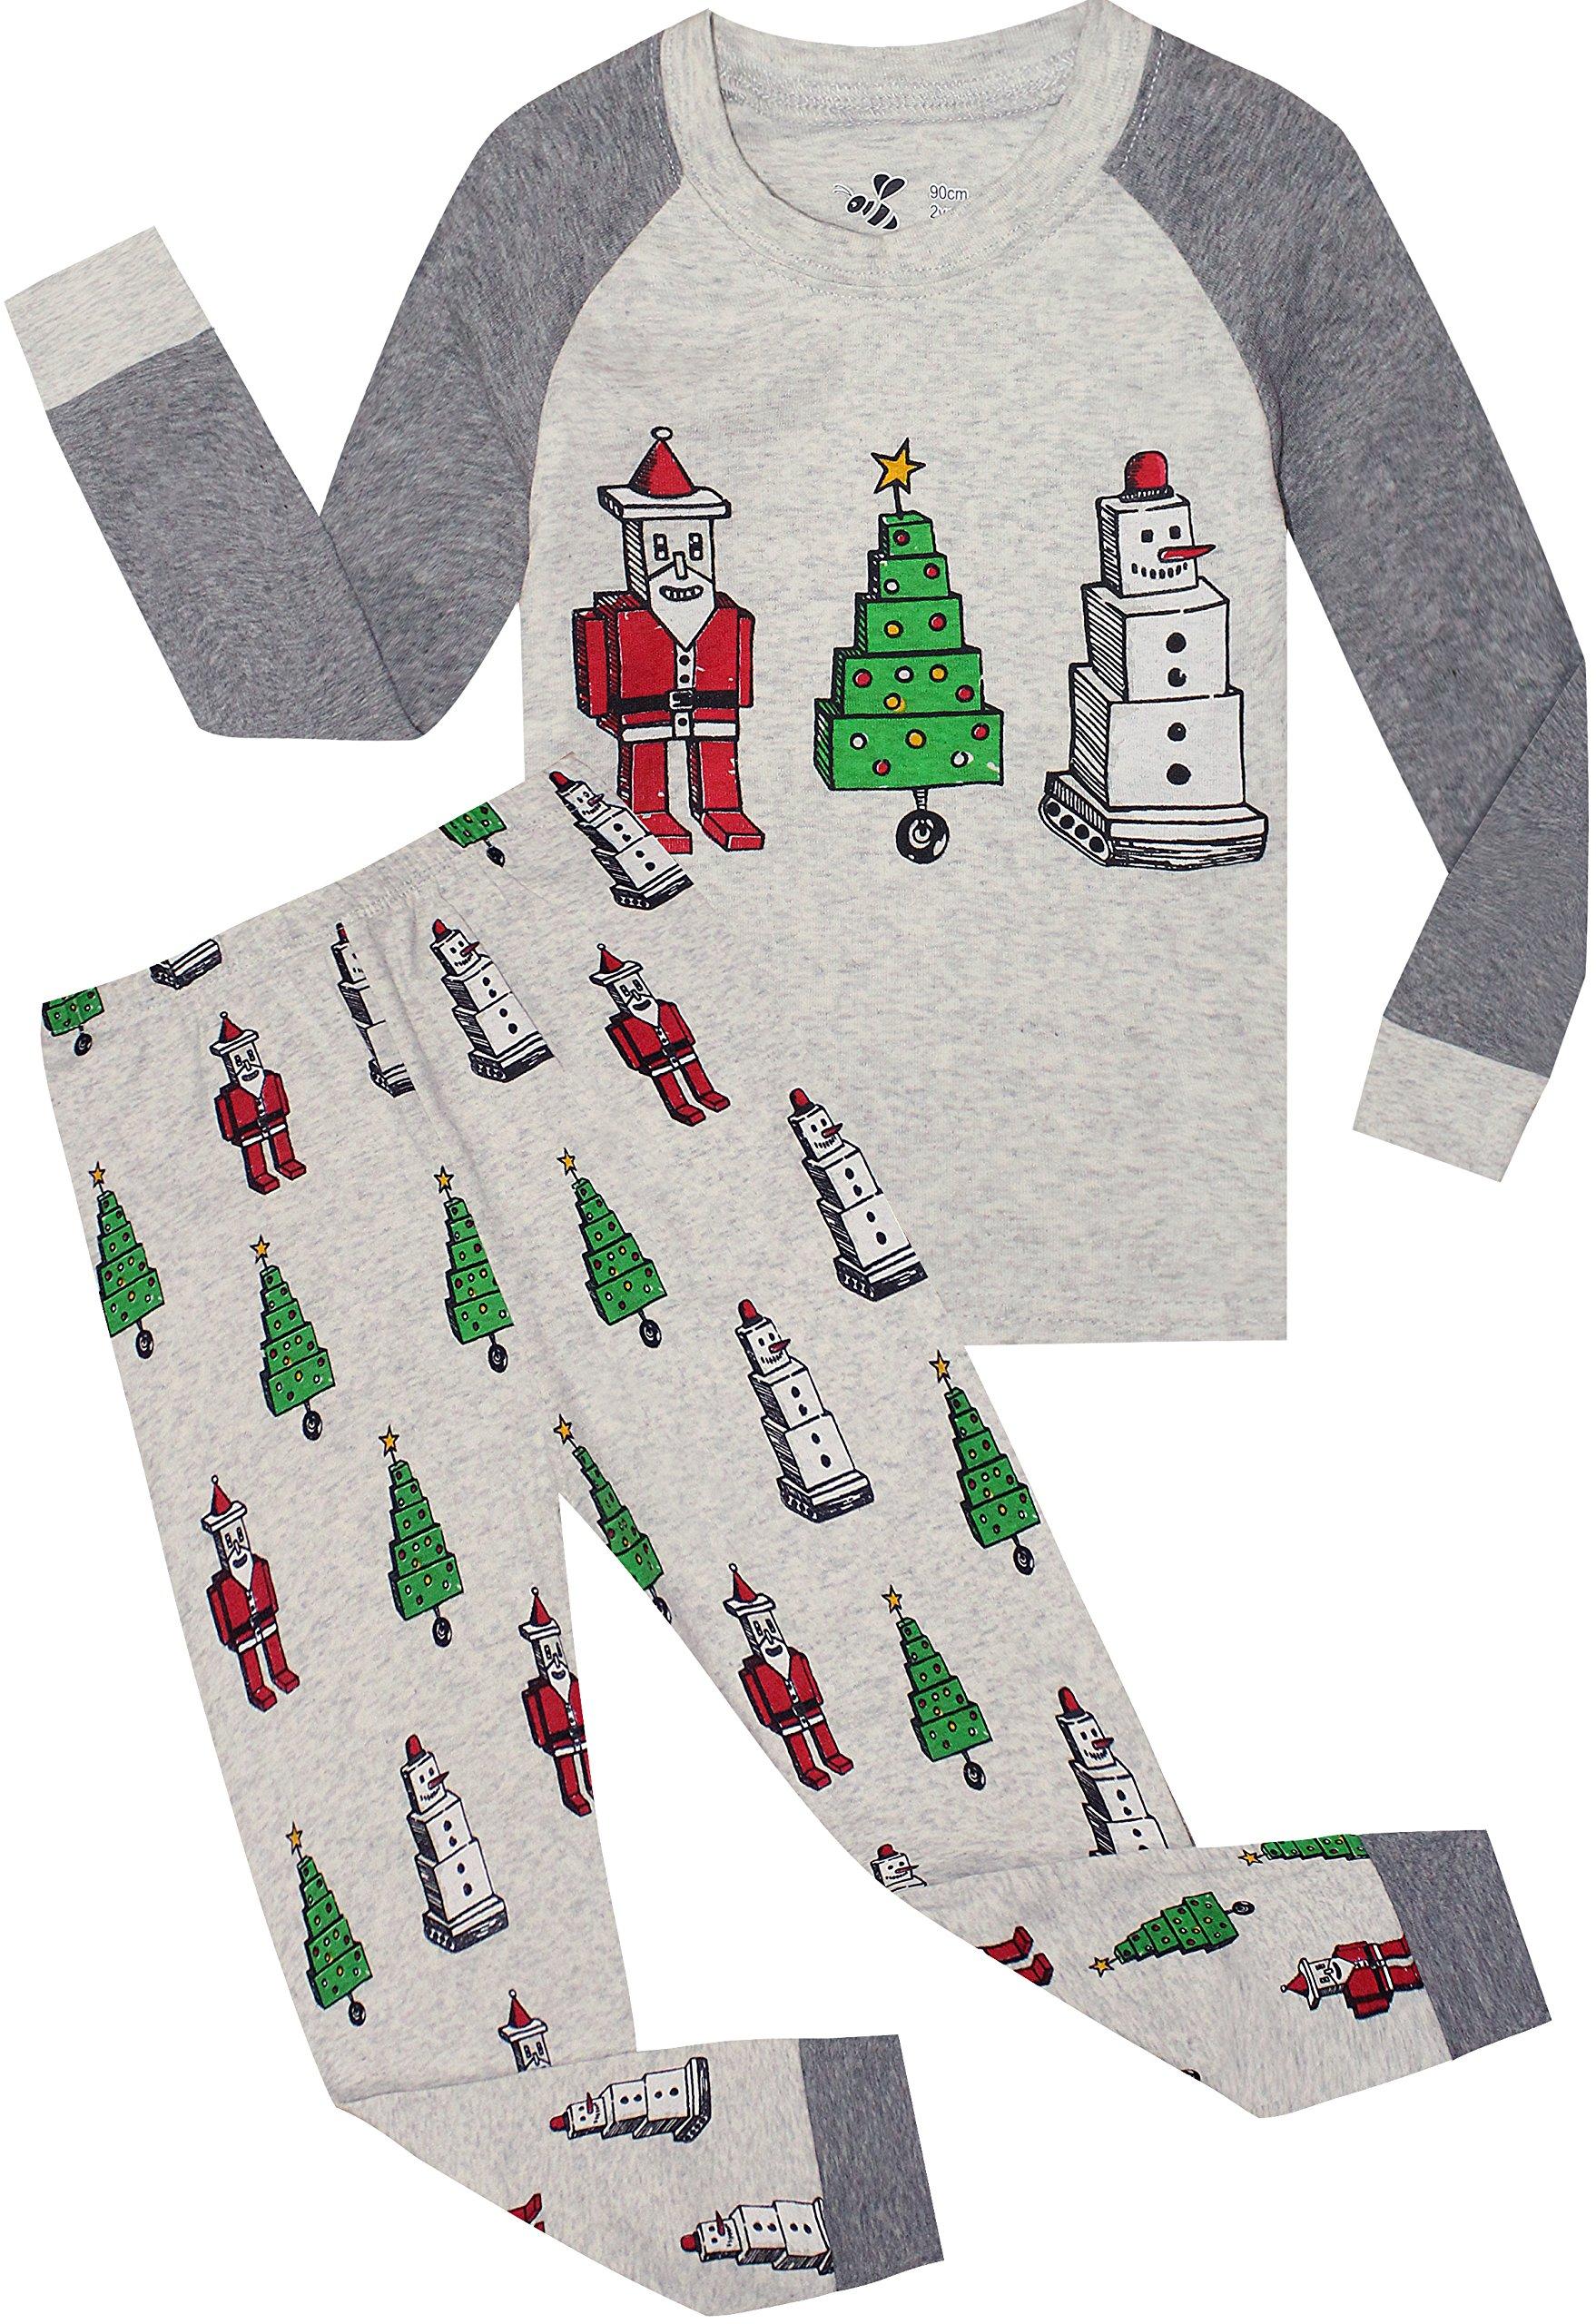 Boys Christmas Pajamas Children Santa Claus PJs Gift Toddler 2 Pieces Pants Set Sleepwear Size 7 Years